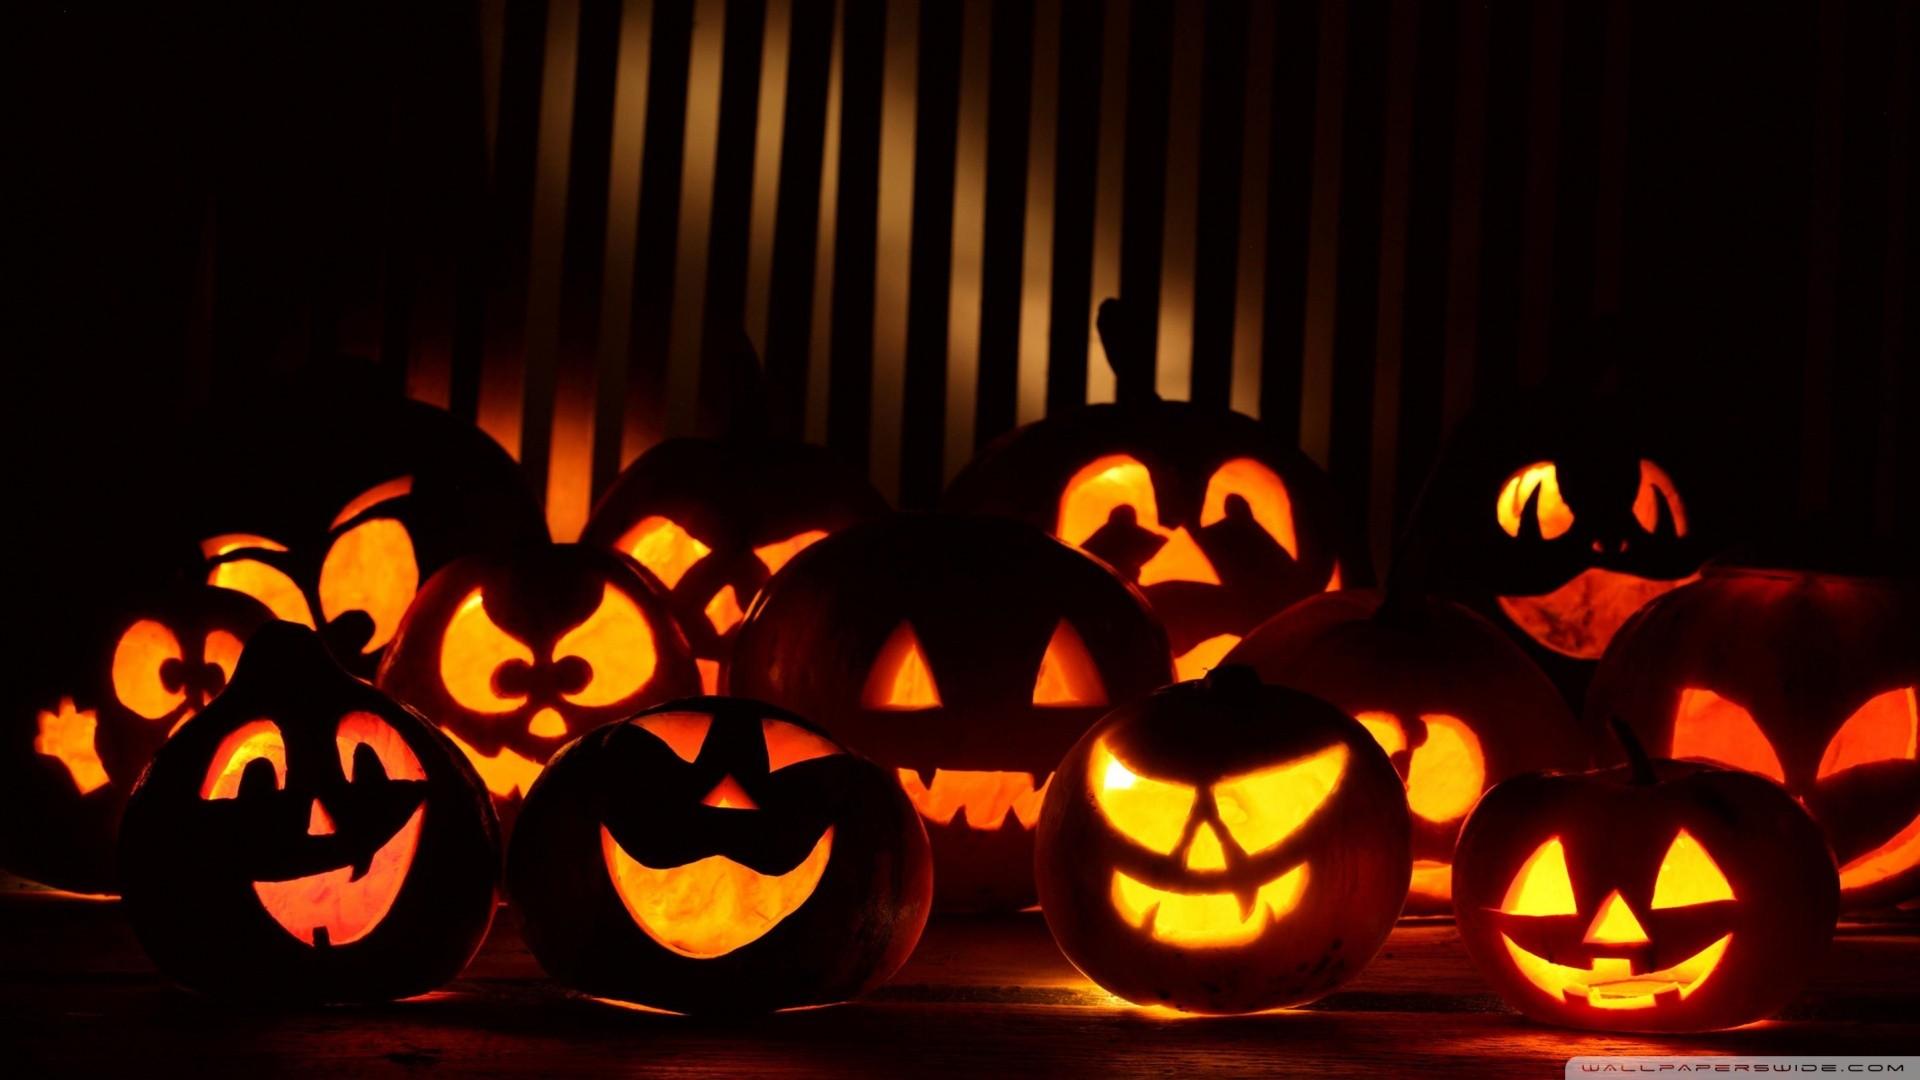 Wonderful Wallpaper Halloween Home Screen - 389177-popular-halloween-wallpaper-hd-1920x1080  Snapshot_434617.jpg